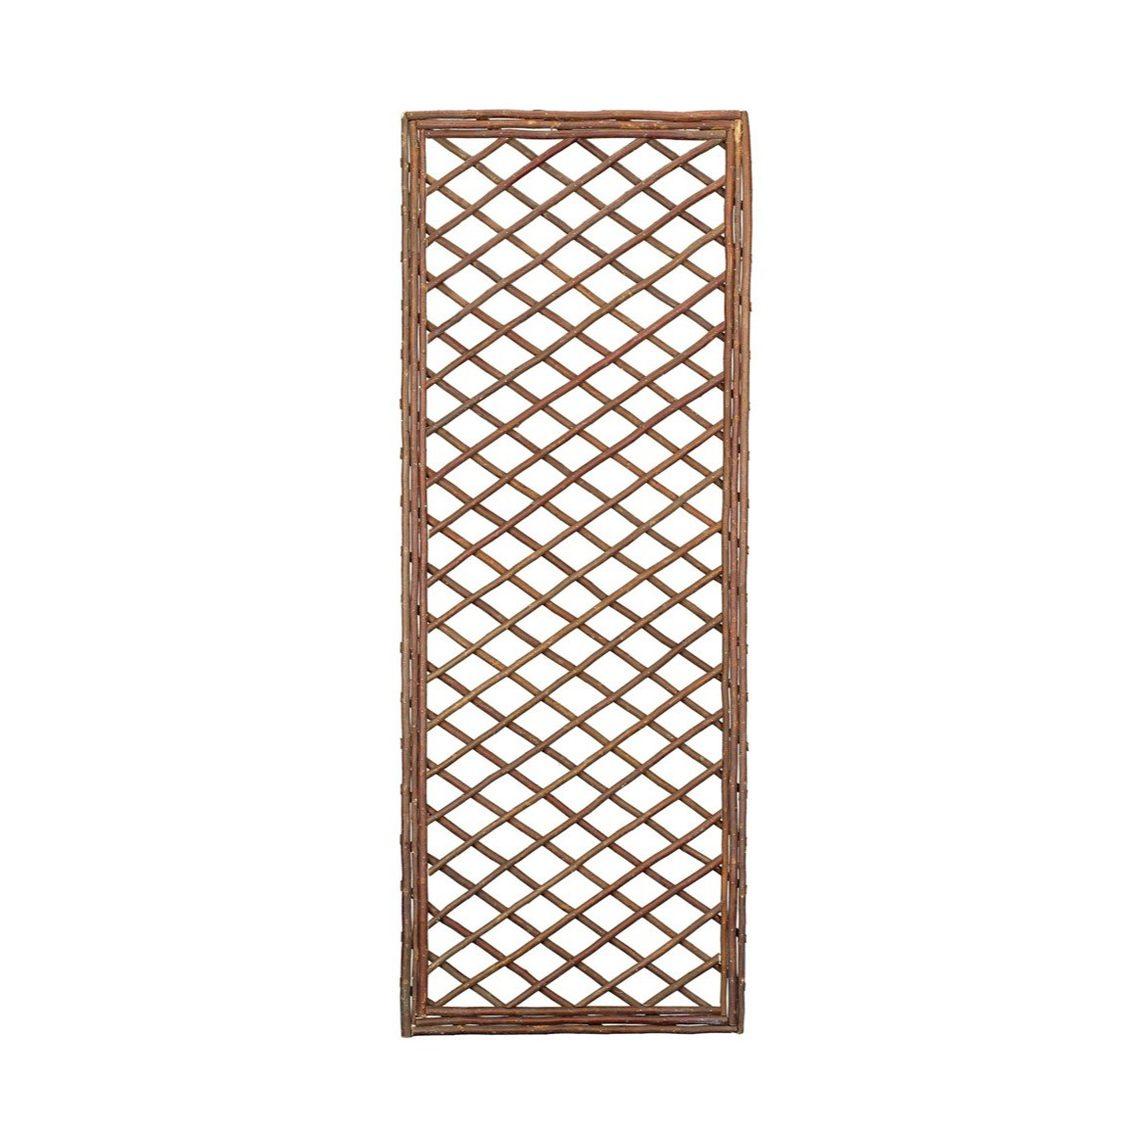 Gardman 1.2m x 0.45m Framed Willow Trellis Panel